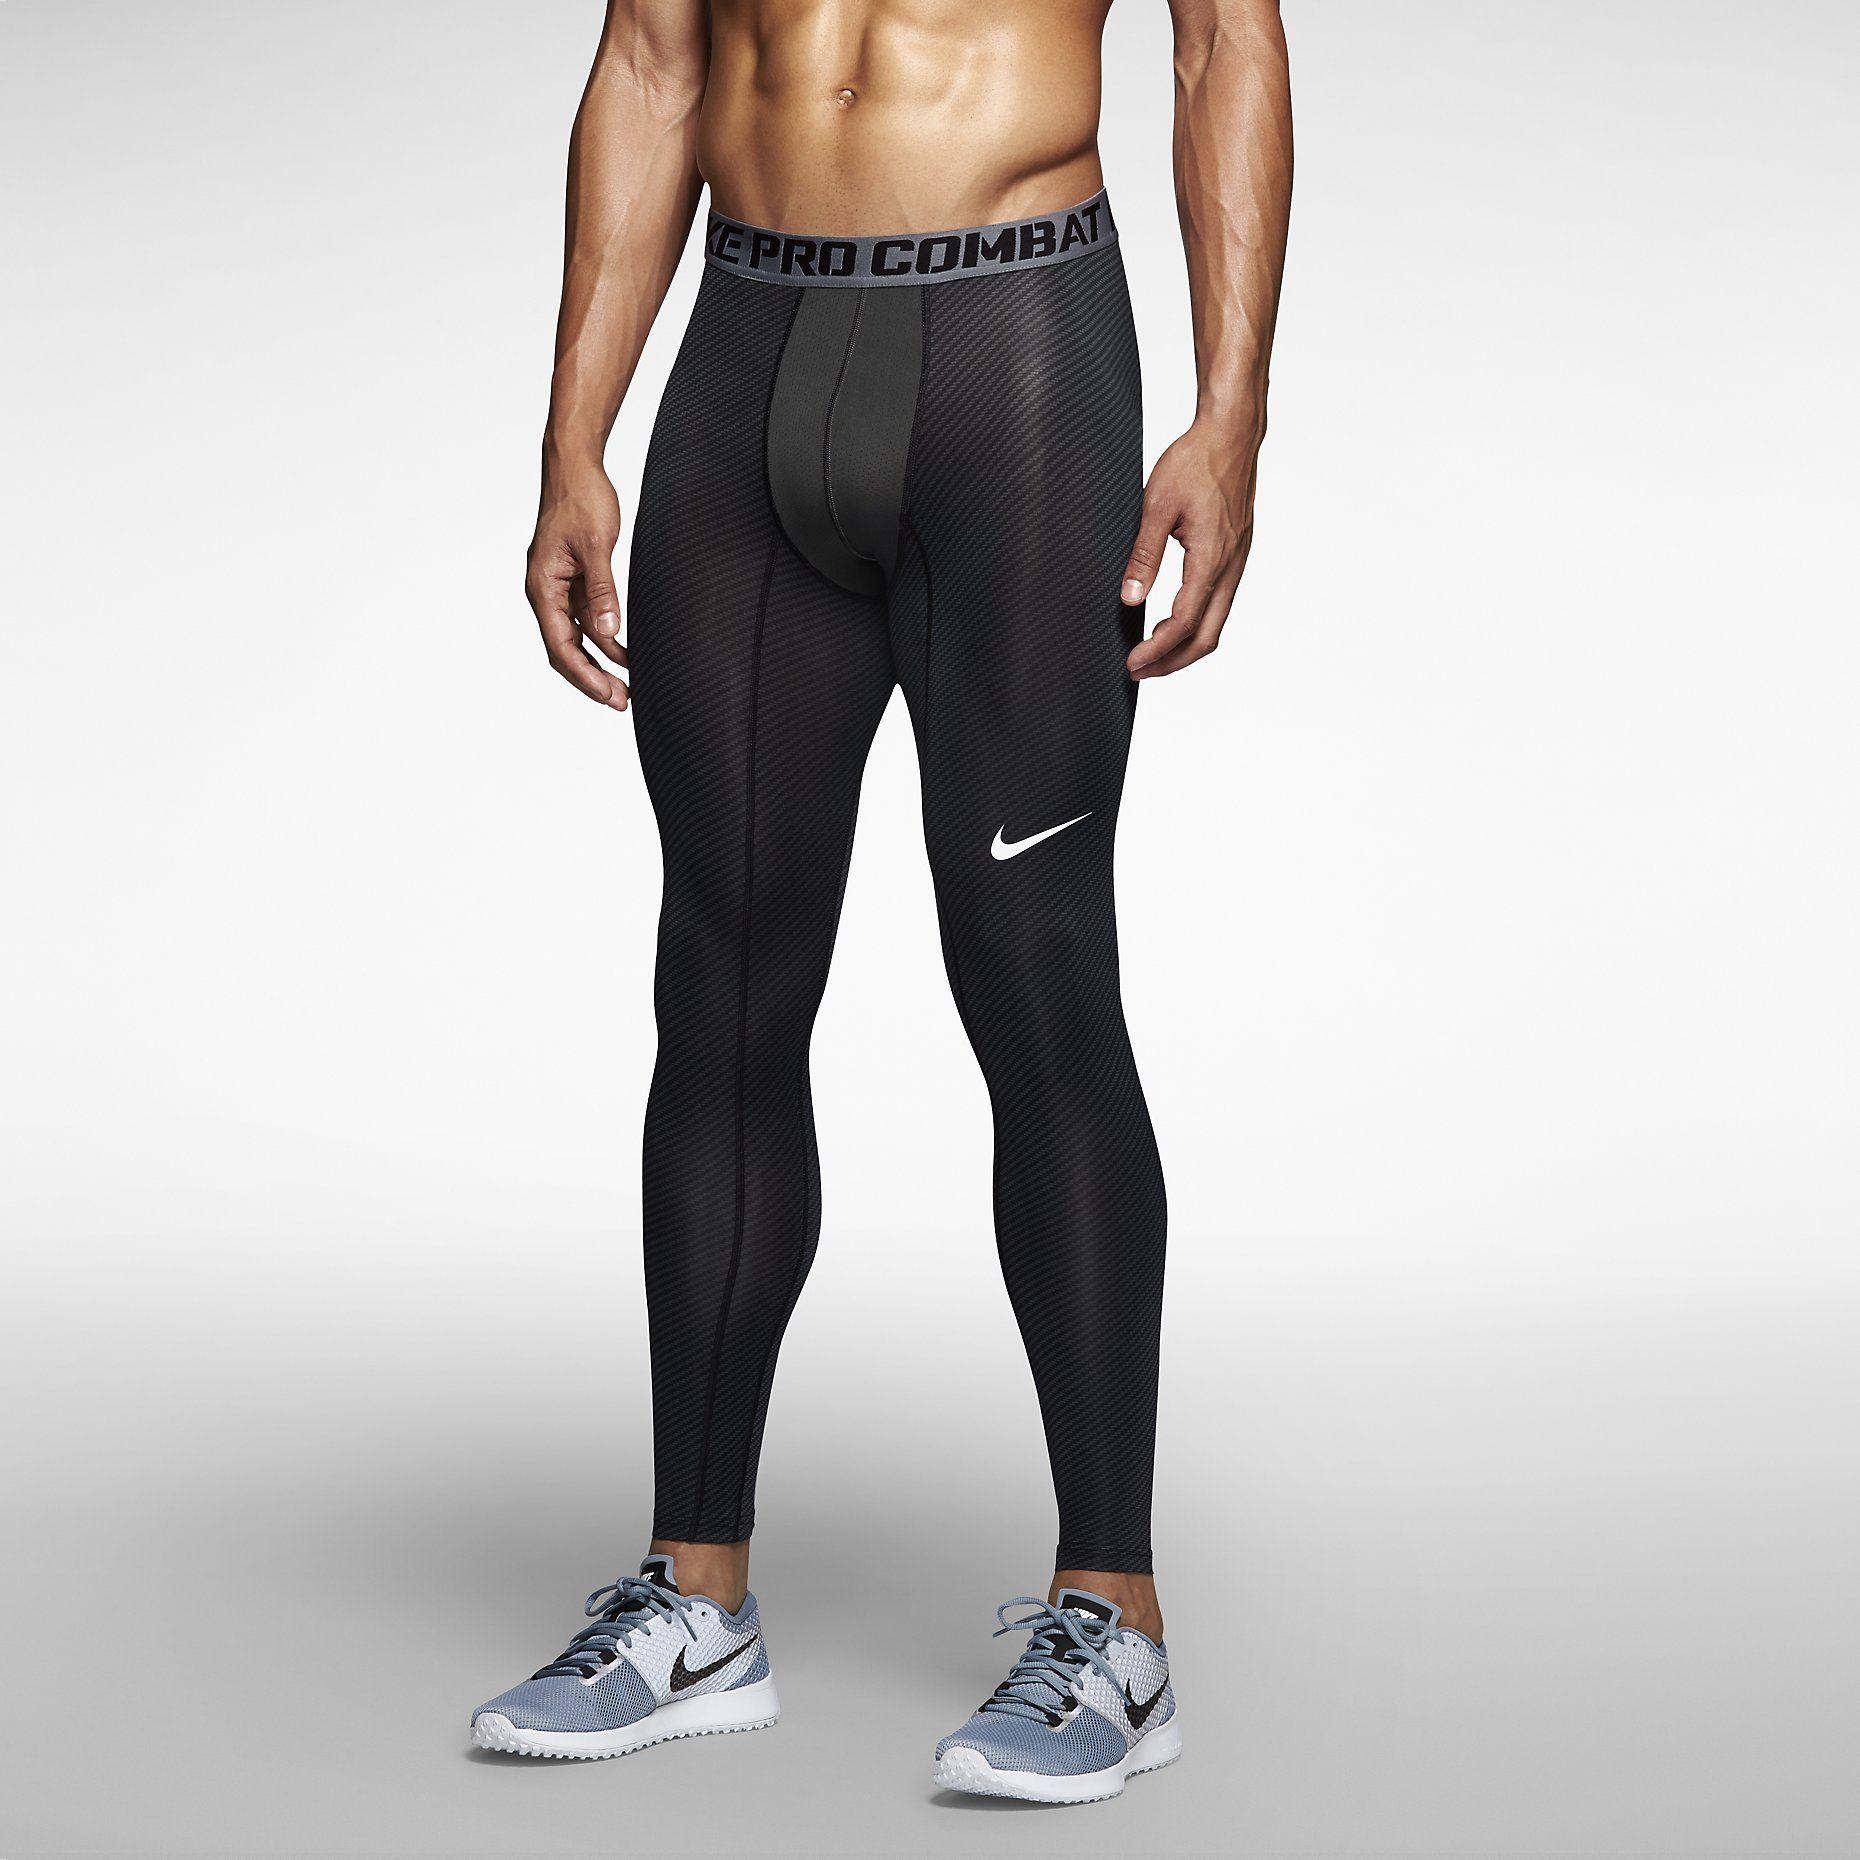 c91007ea32200b Nike Pro Combat Core Compression Carbon Fiber Men's Tights. Nike Store